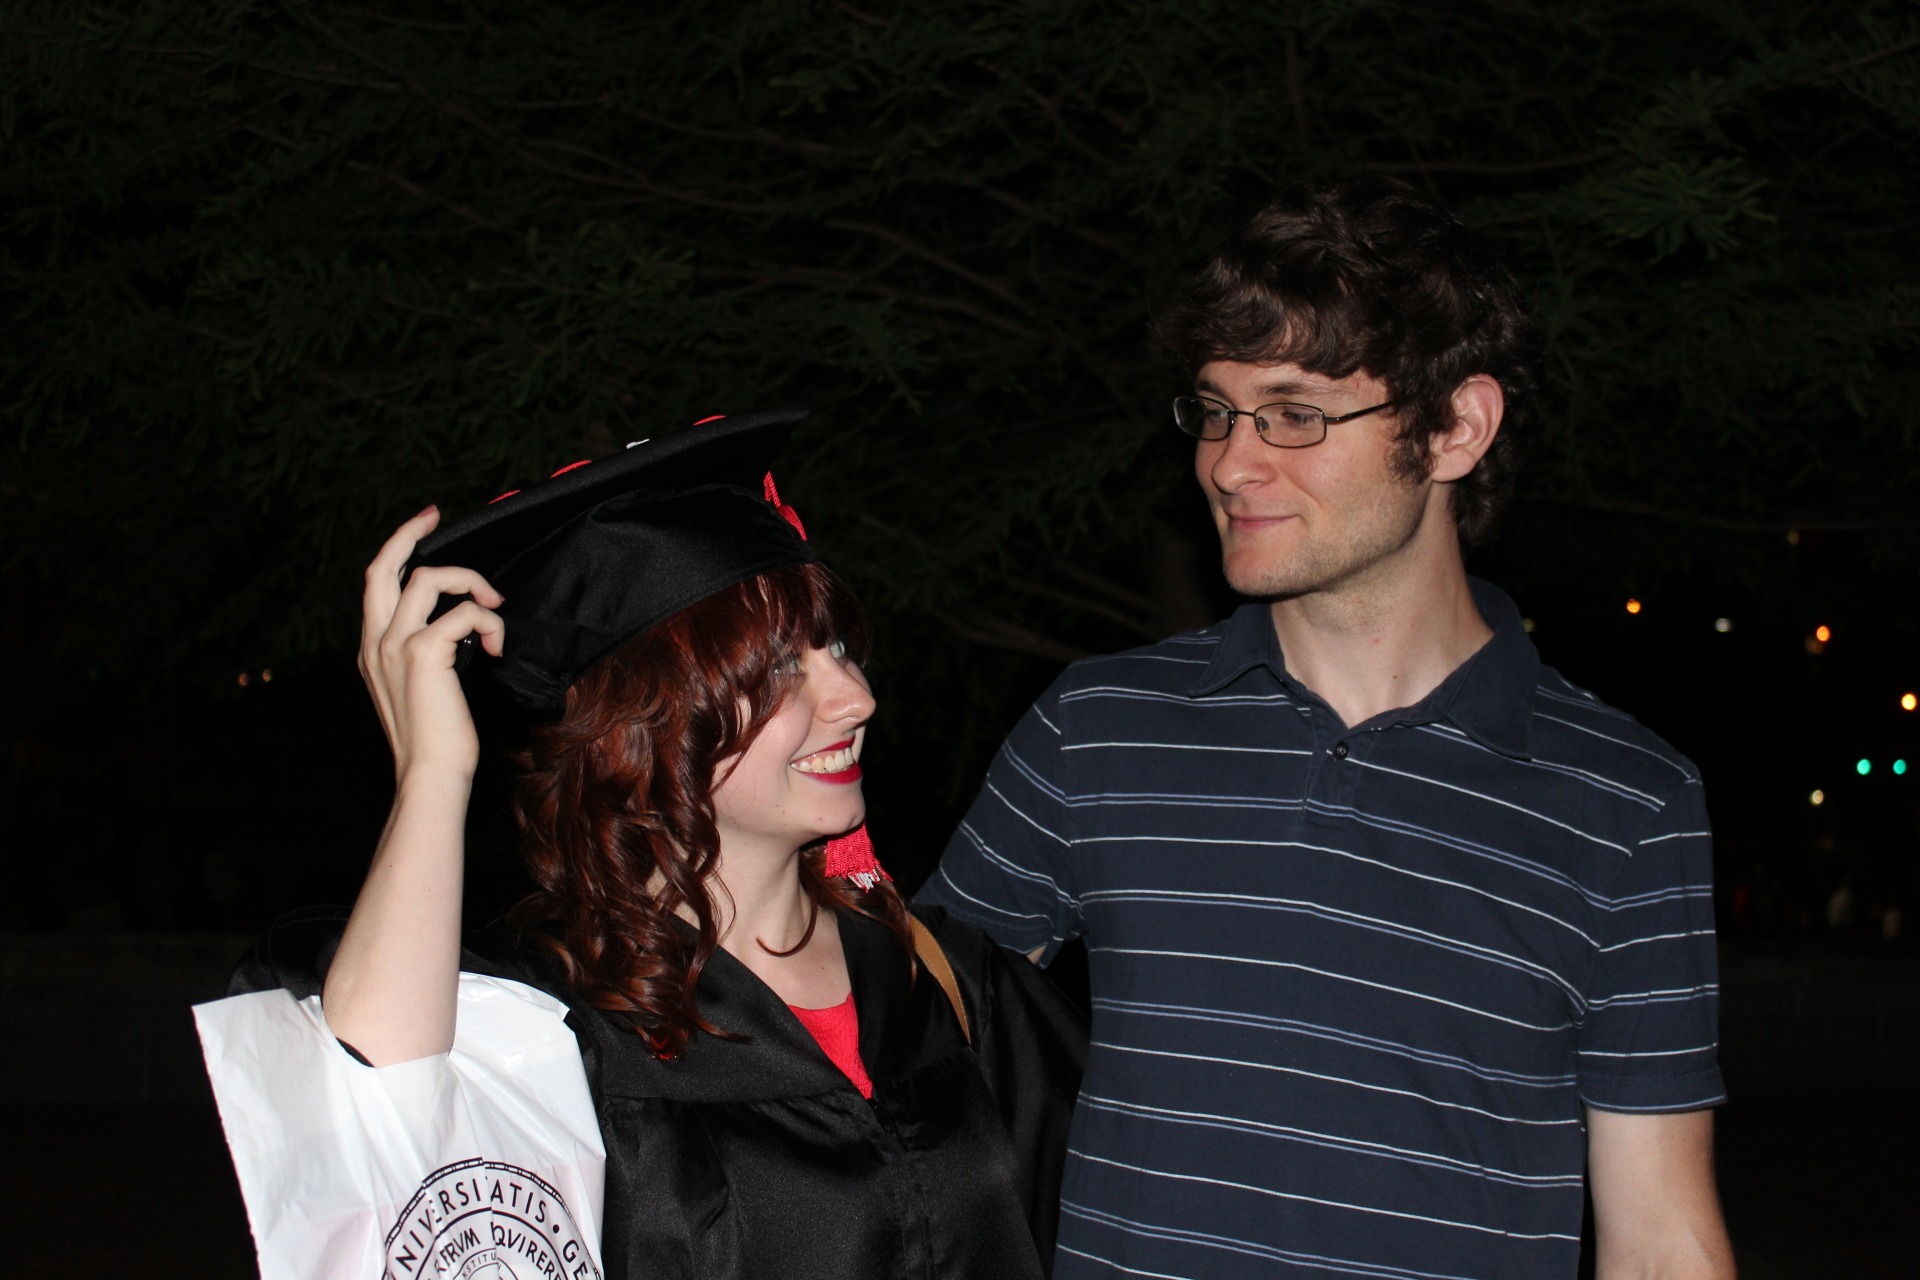 2012 - Jamie's College Graduation